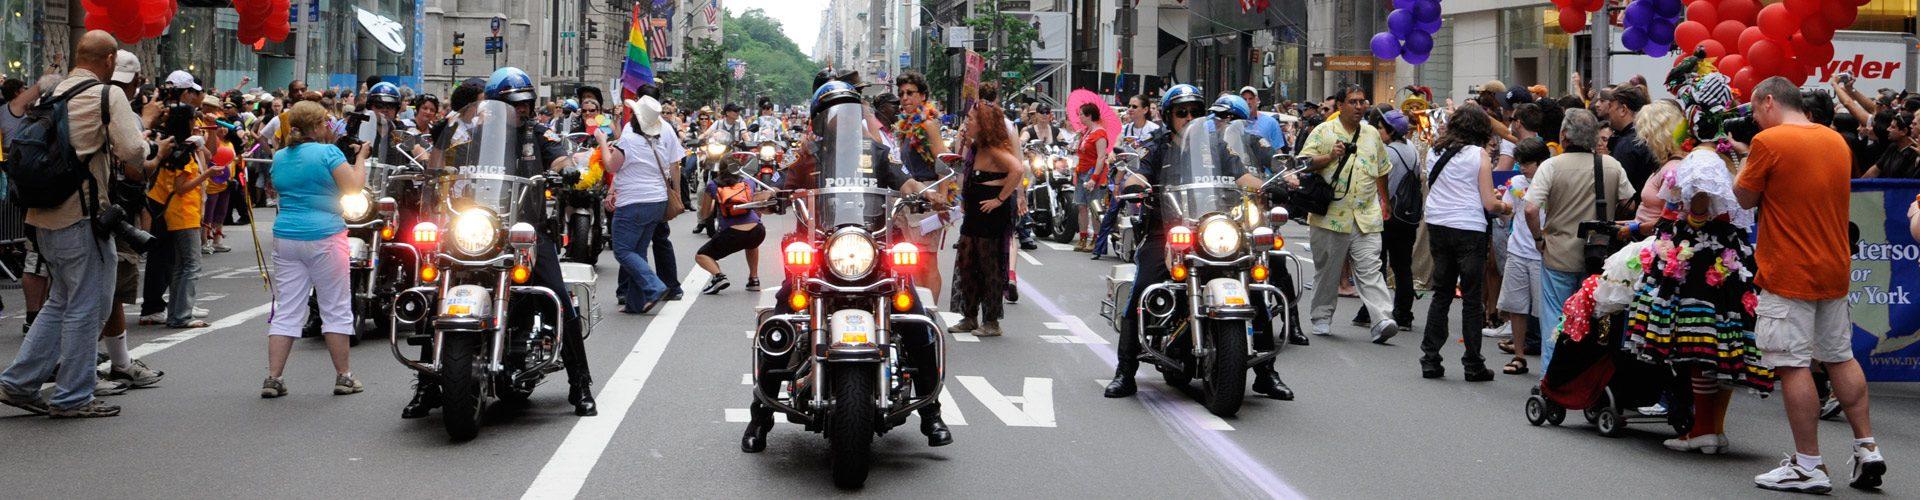 New York Pride Parade, New York City